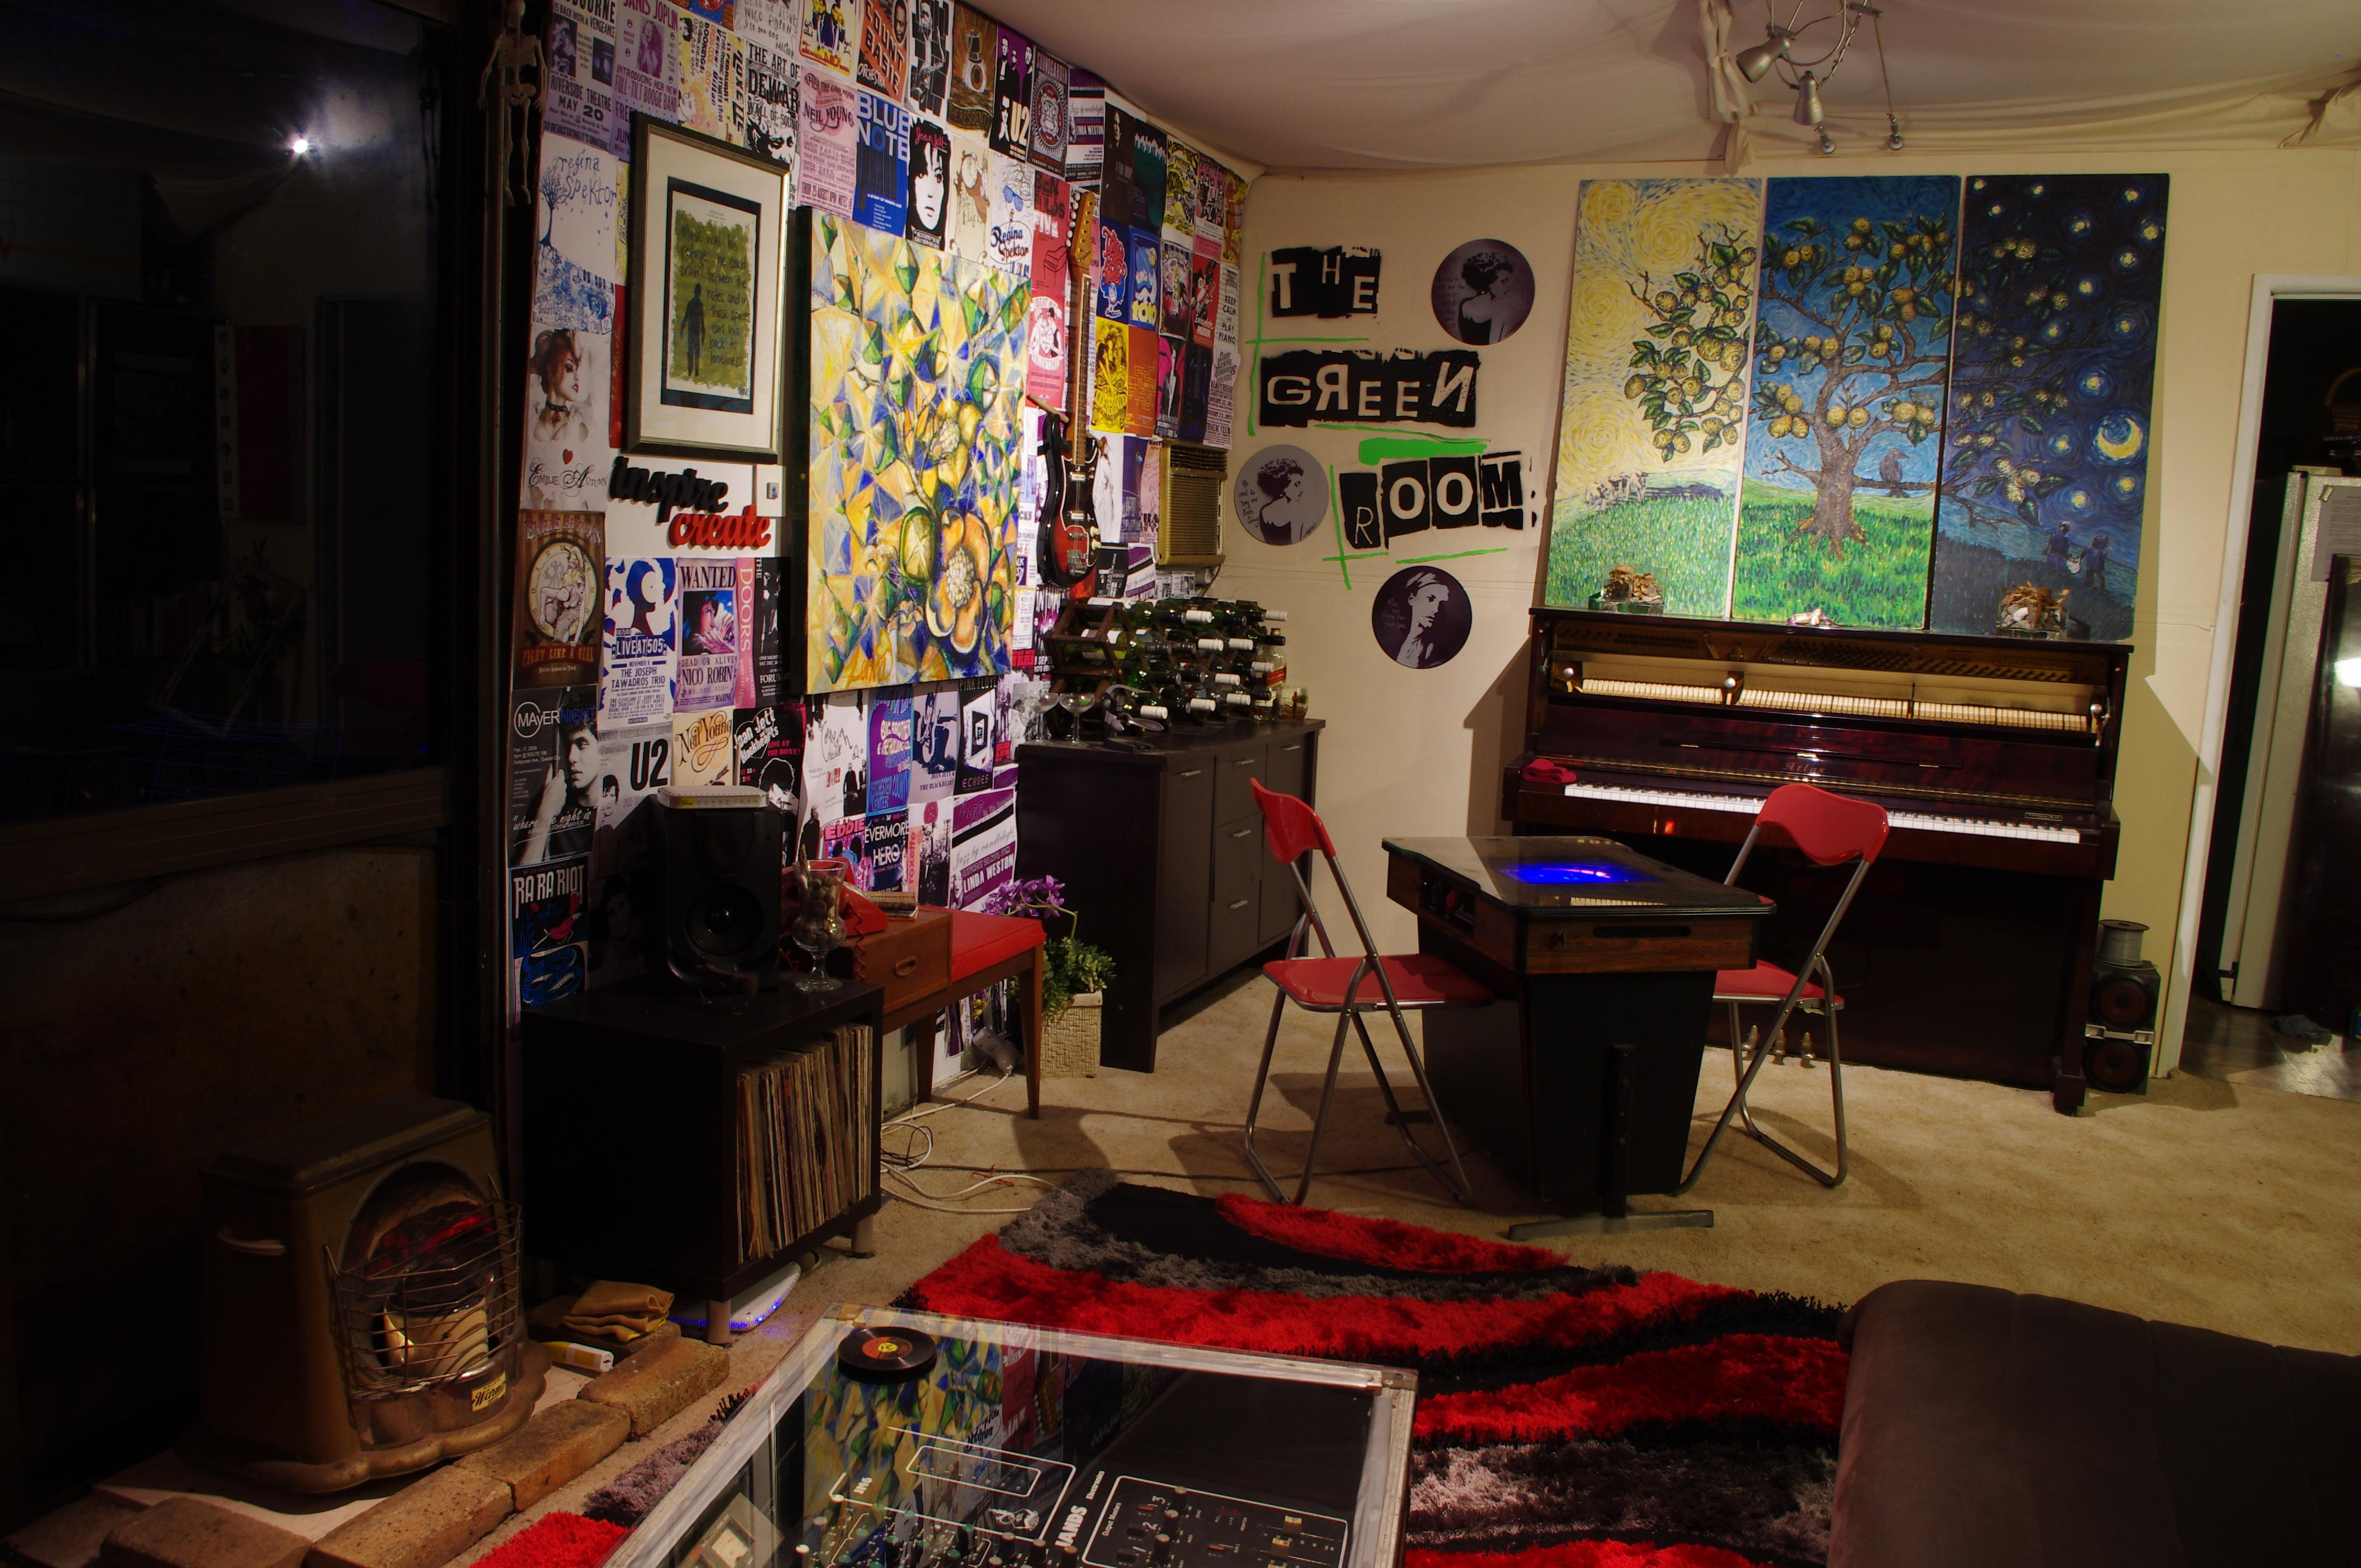 Green Room - 04